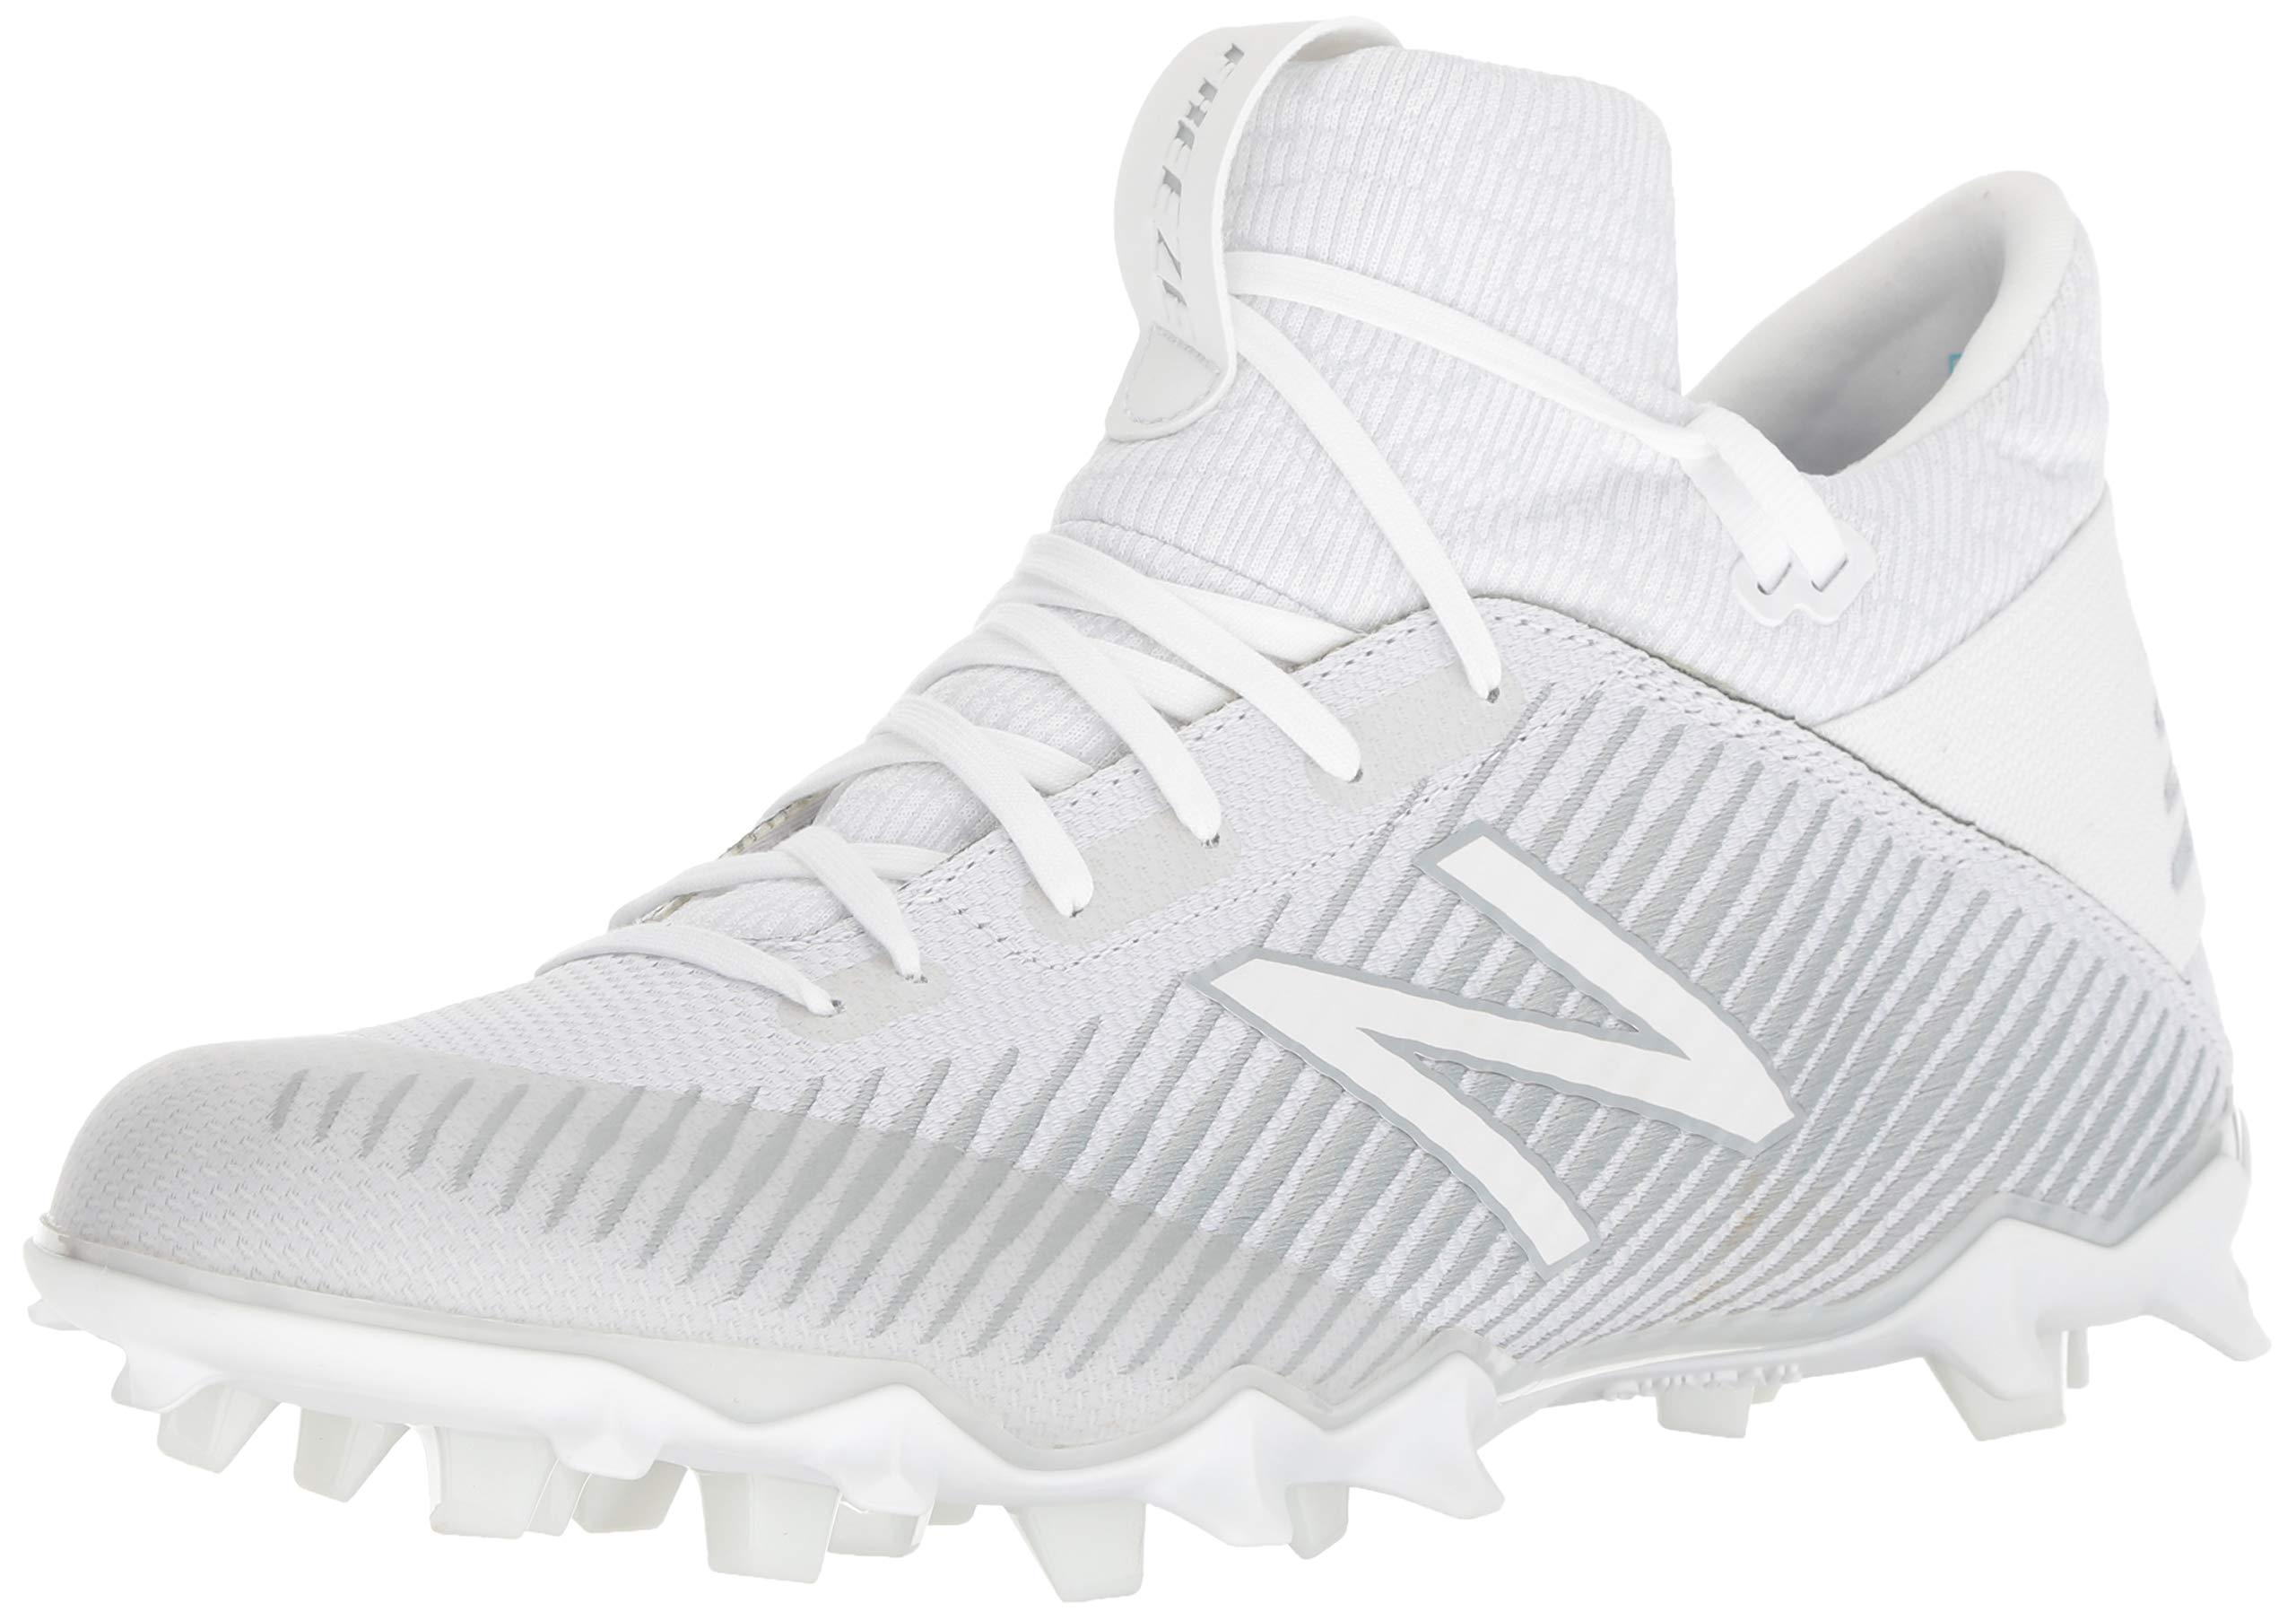 New Balance Men's Freeze V2 Agility Lacrosse Shoe, White, 11 D US by New Balance